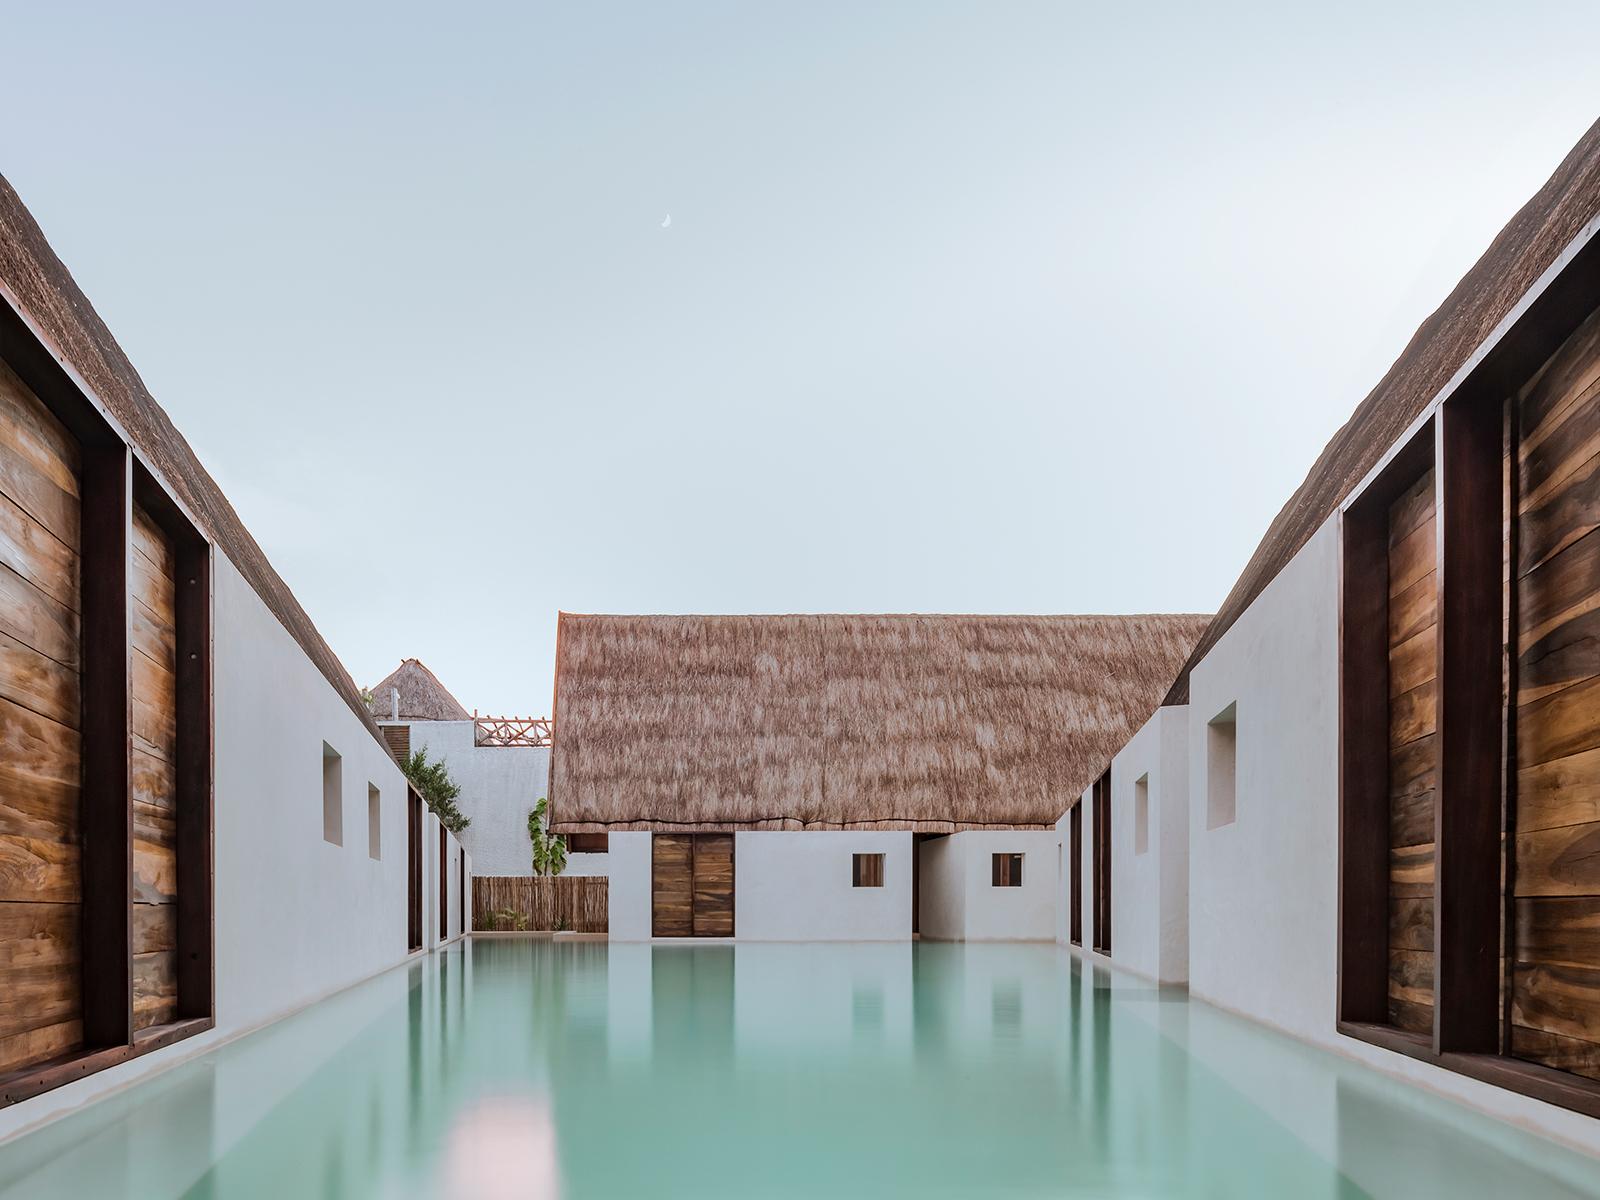 5 hotelitos de playa chiquitos y bonitos para hospedarte en Holbox